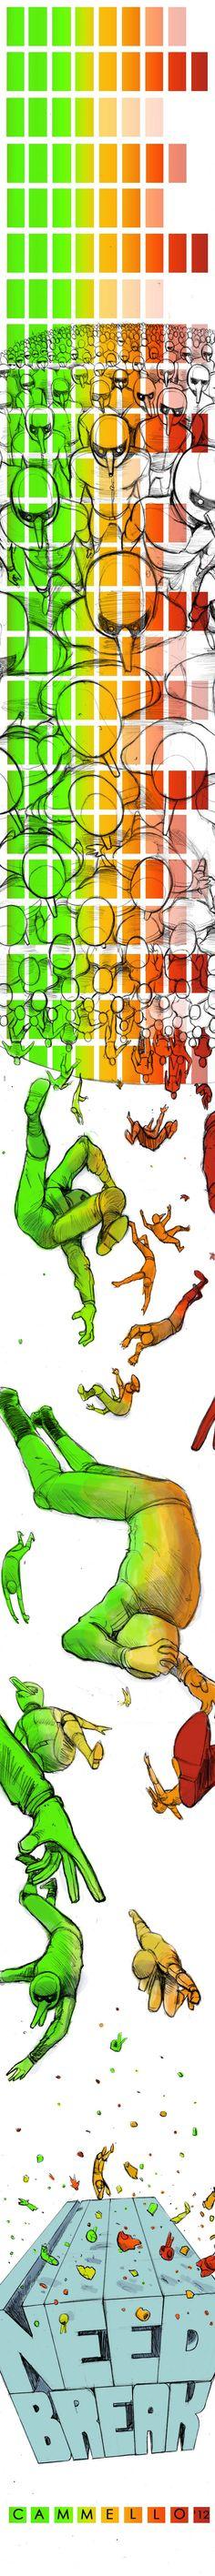 #comics  Awesome!!